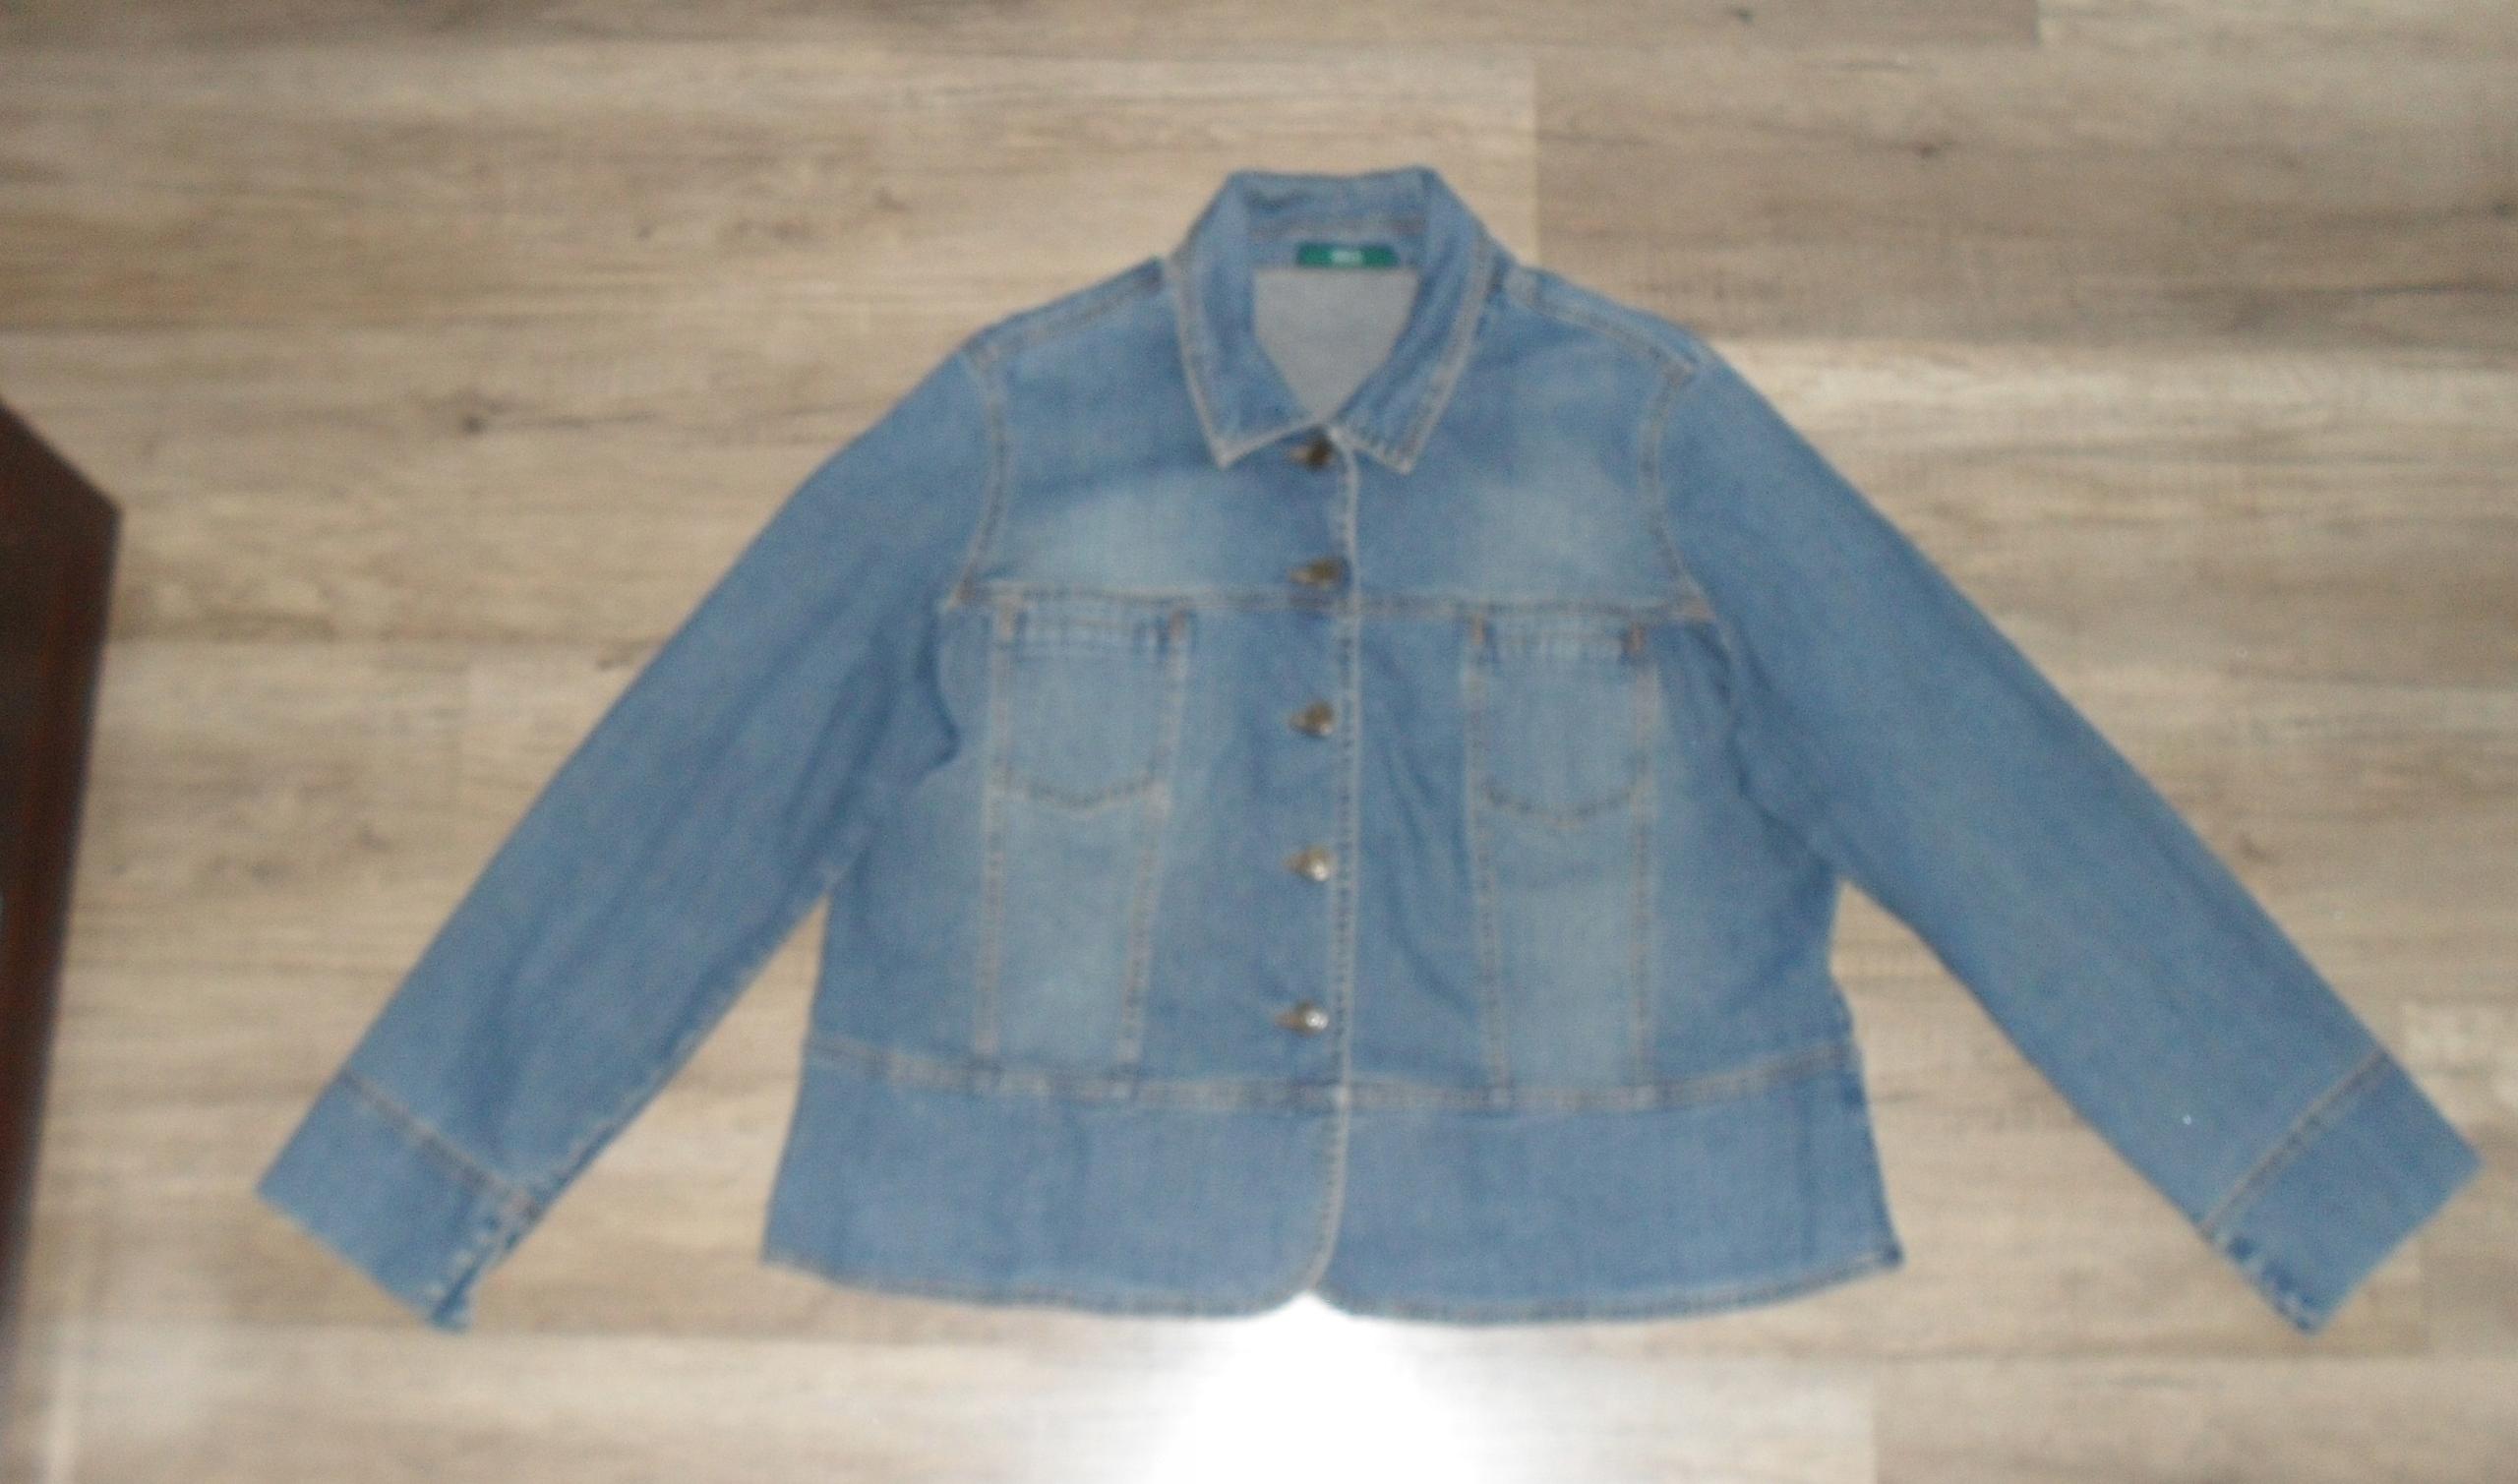 Marks & spencer Piękna kurtka jeansowa r 48/50